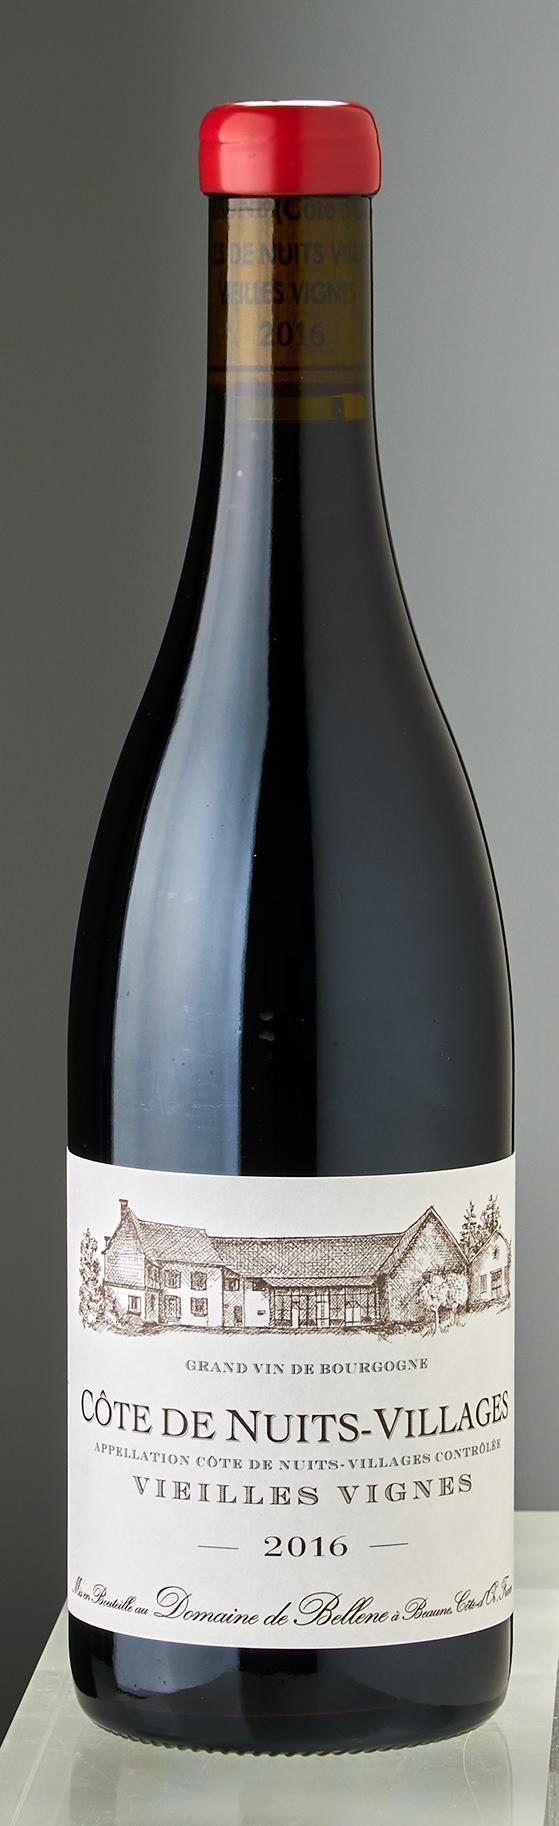 FET_Vinhandlere_favoritter_vin_Theis-Vine